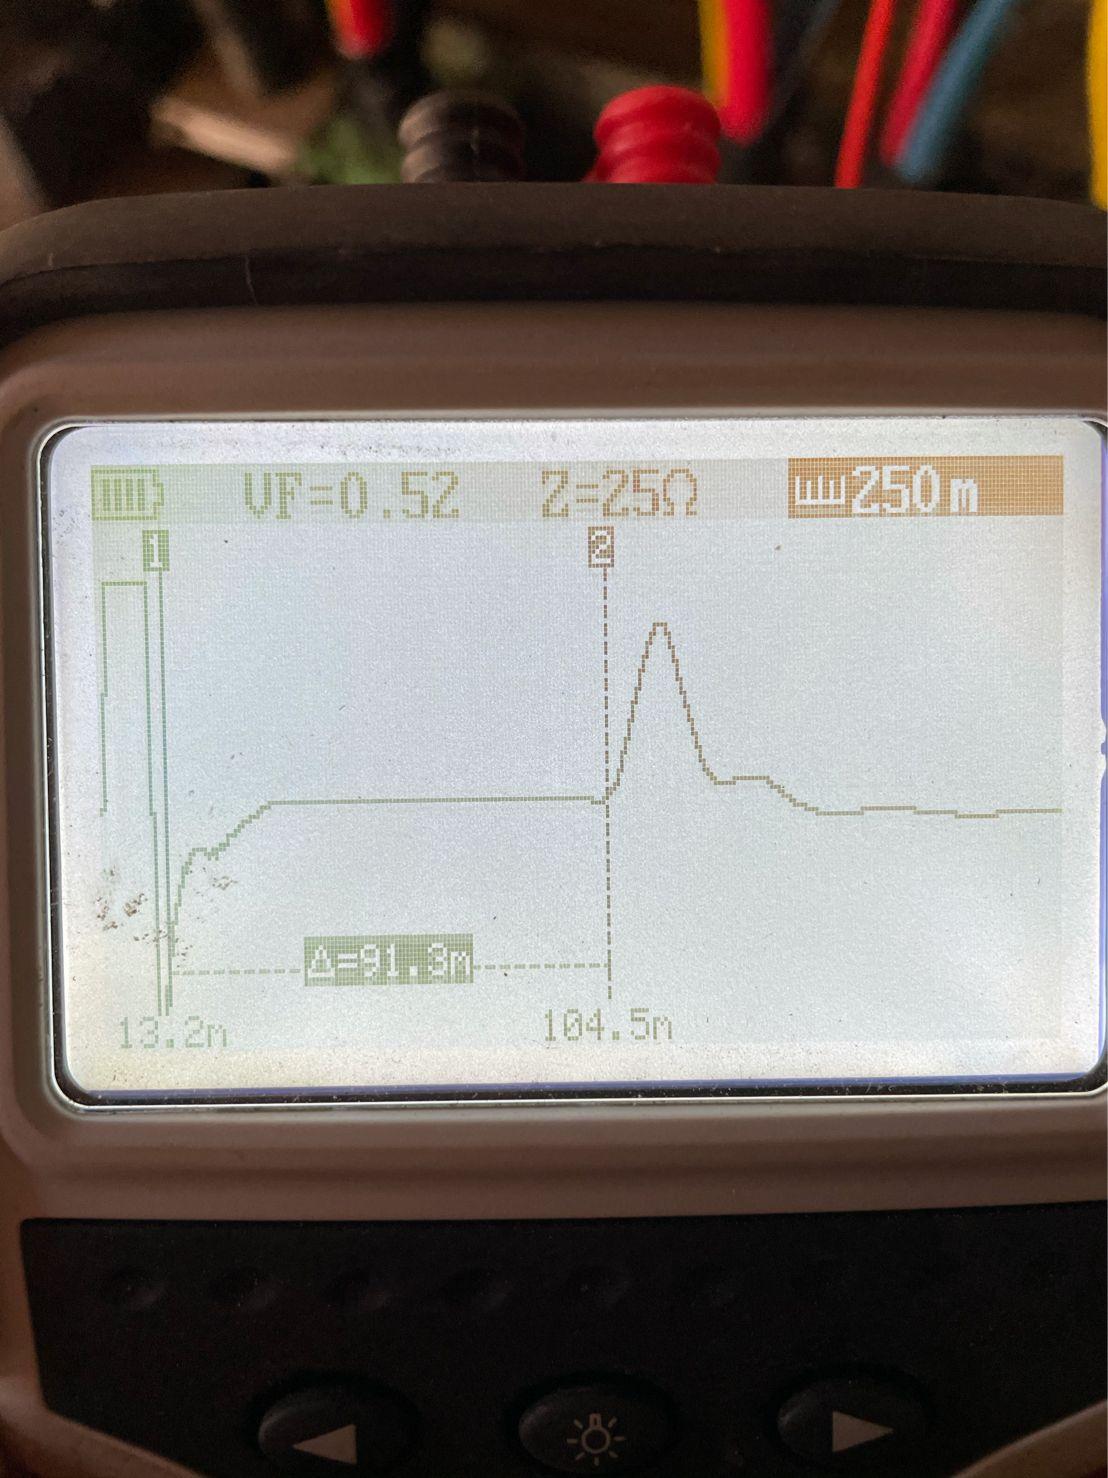 Megger TDR1000/3P Handheld TDR For Power Application